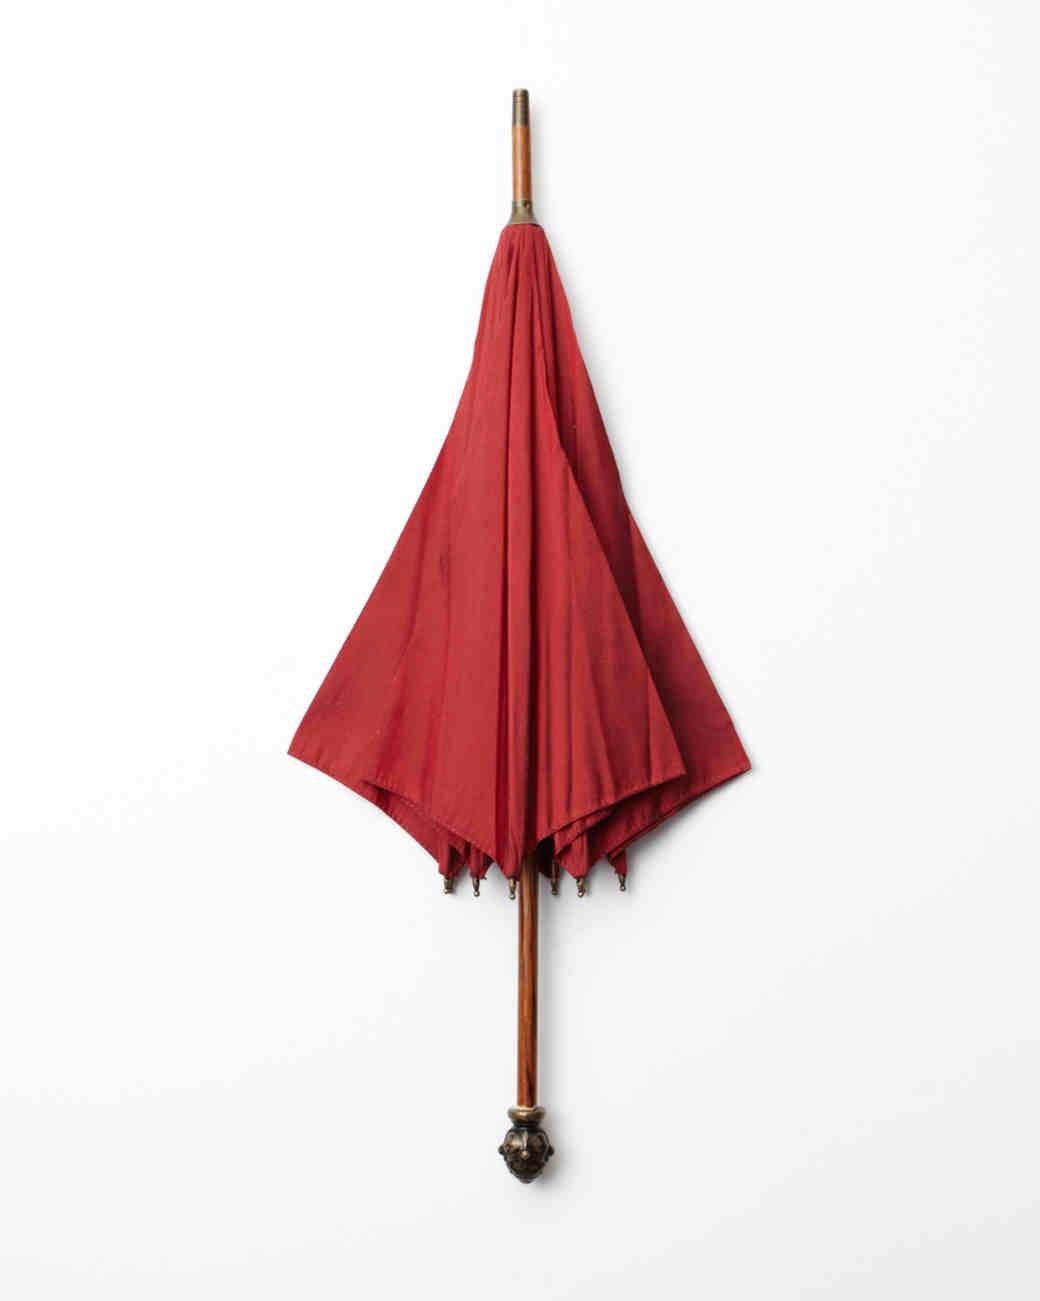 umbrella-wd108931.jpg